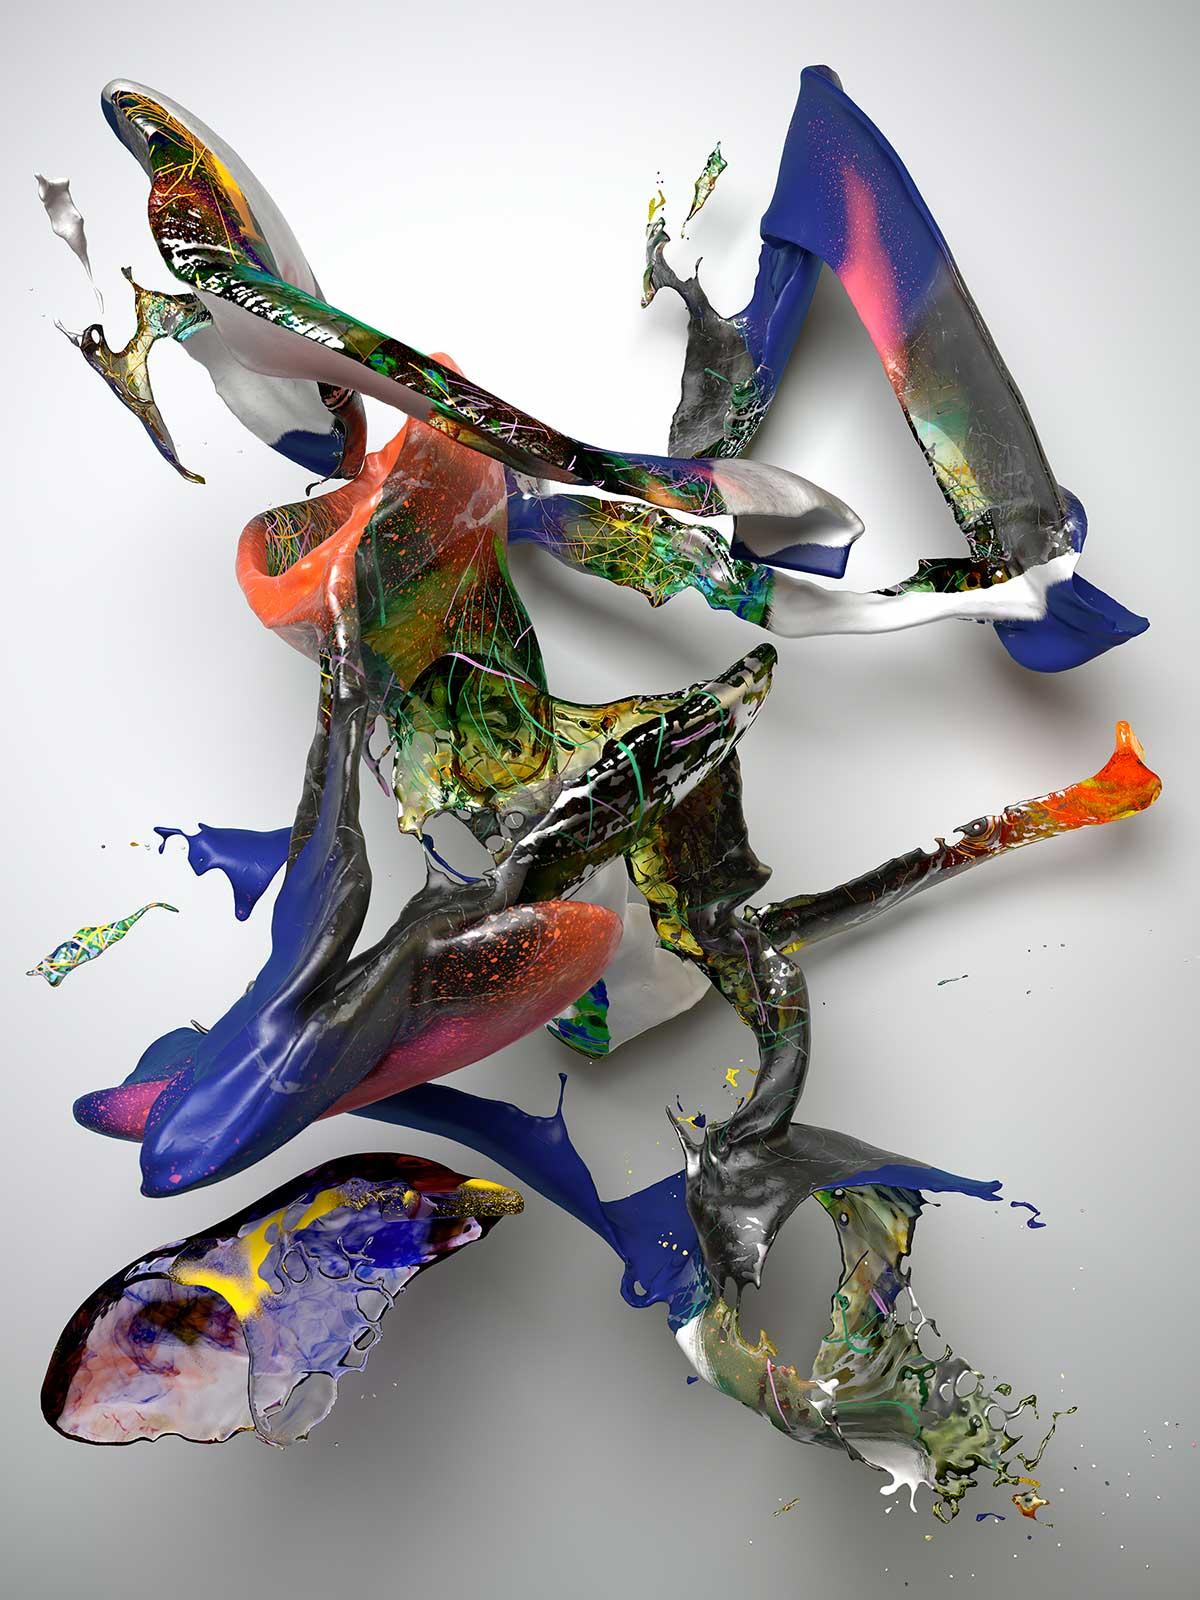 Substance I 01, CGI Fine Art Print, 200 x 150 cm, 2017